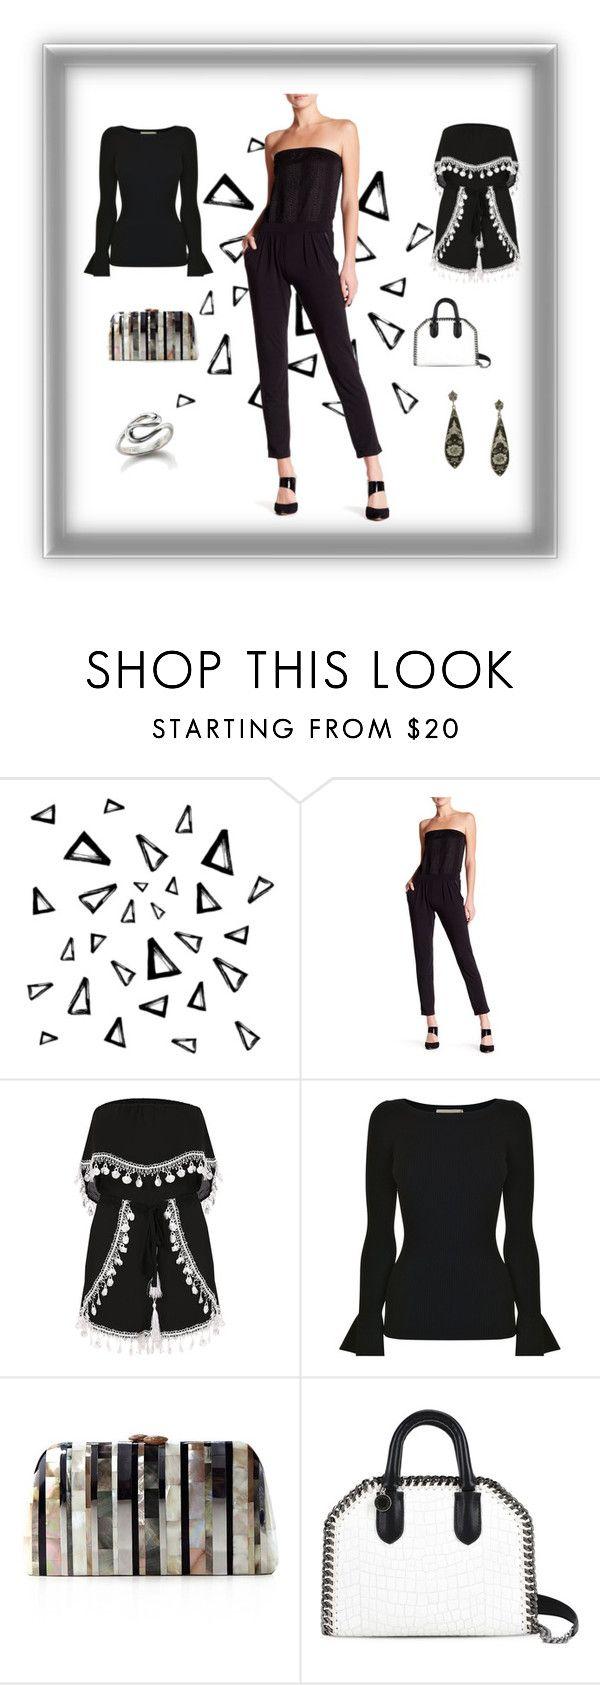 17 best ideas about michael kross on pinterest bags. Black Bedroom Furniture Sets. Home Design Ideas